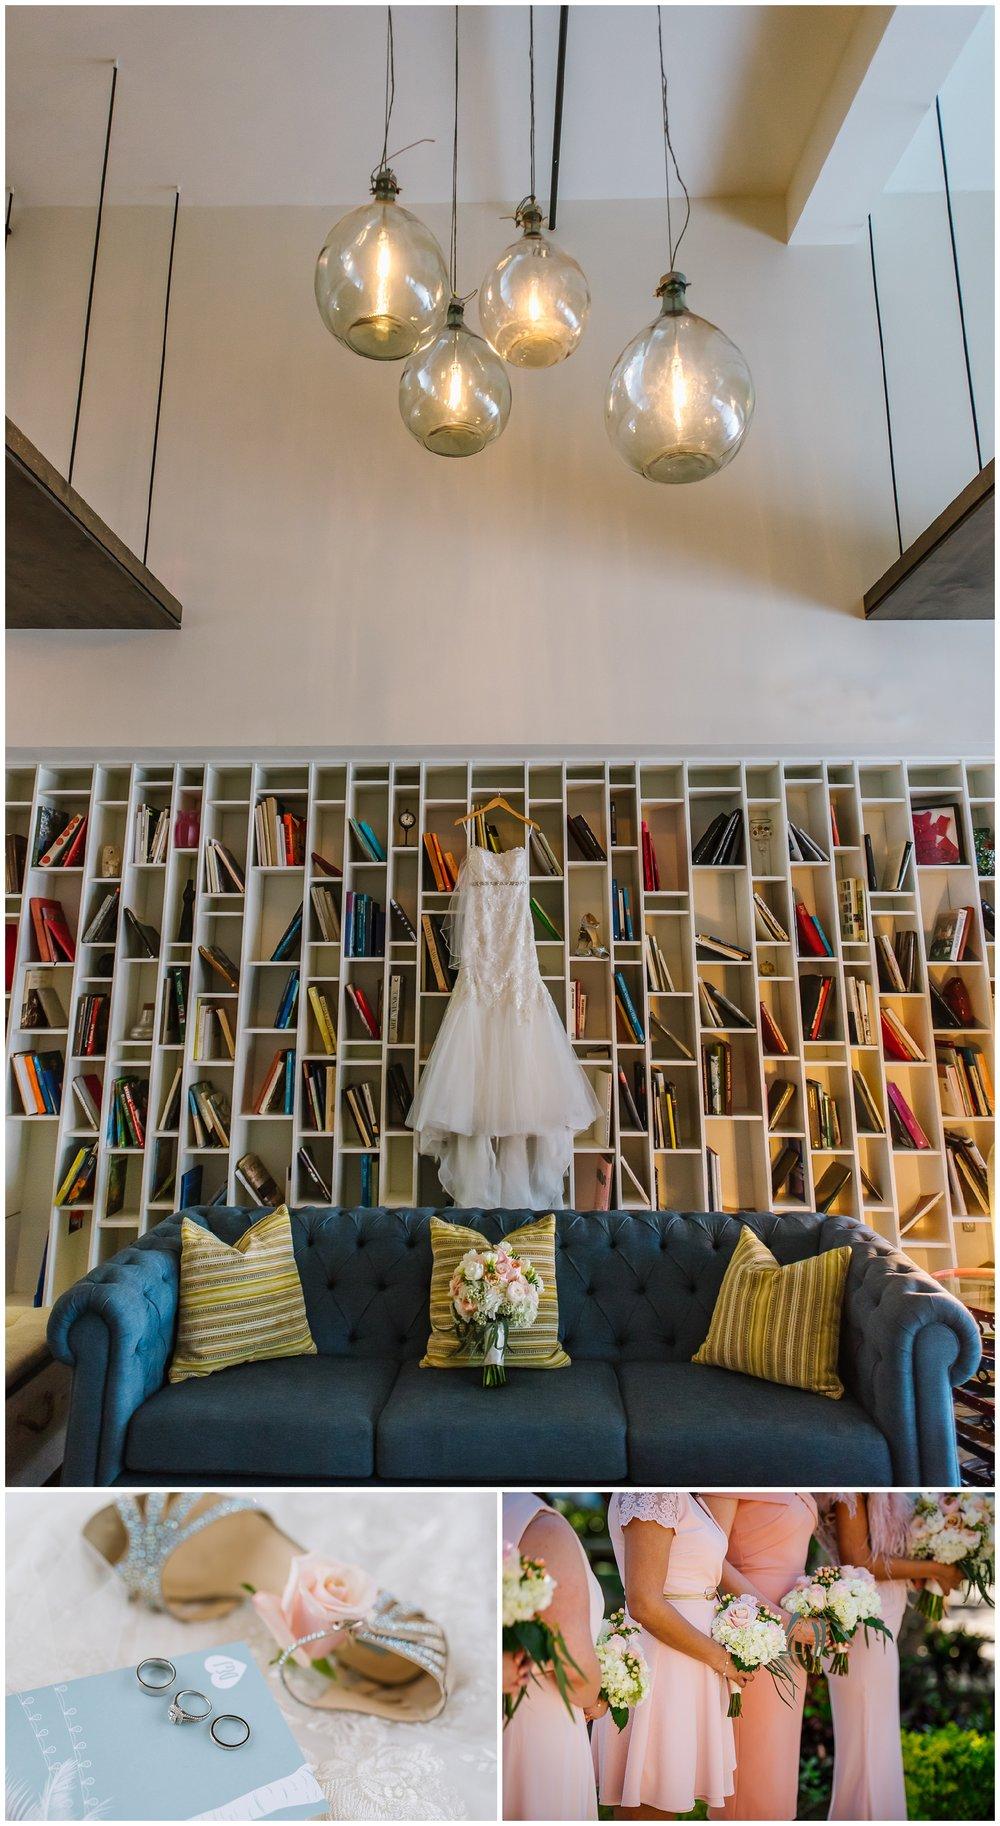 Ashlee-hamon-photography-year-in-review-2016-travel-wanderlust-vsco-adventure-wedding_0067.jpg